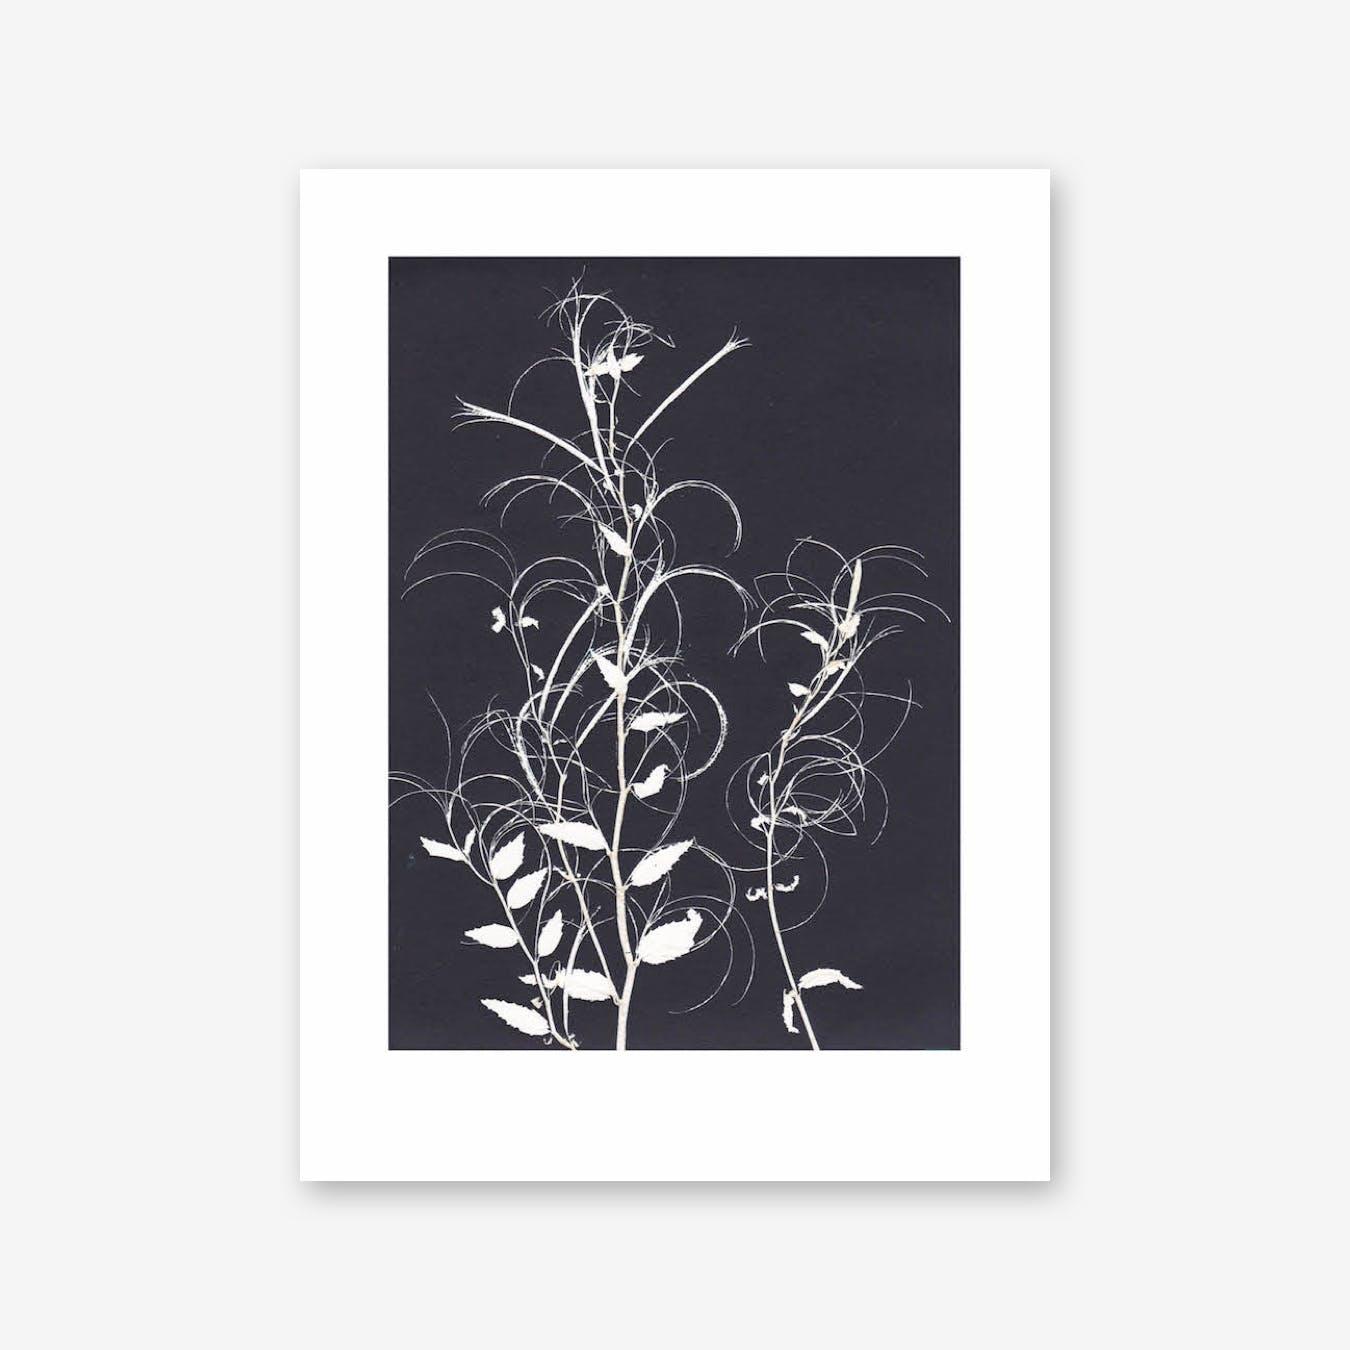 Willow Herb Black Print In 30cm x 40cm